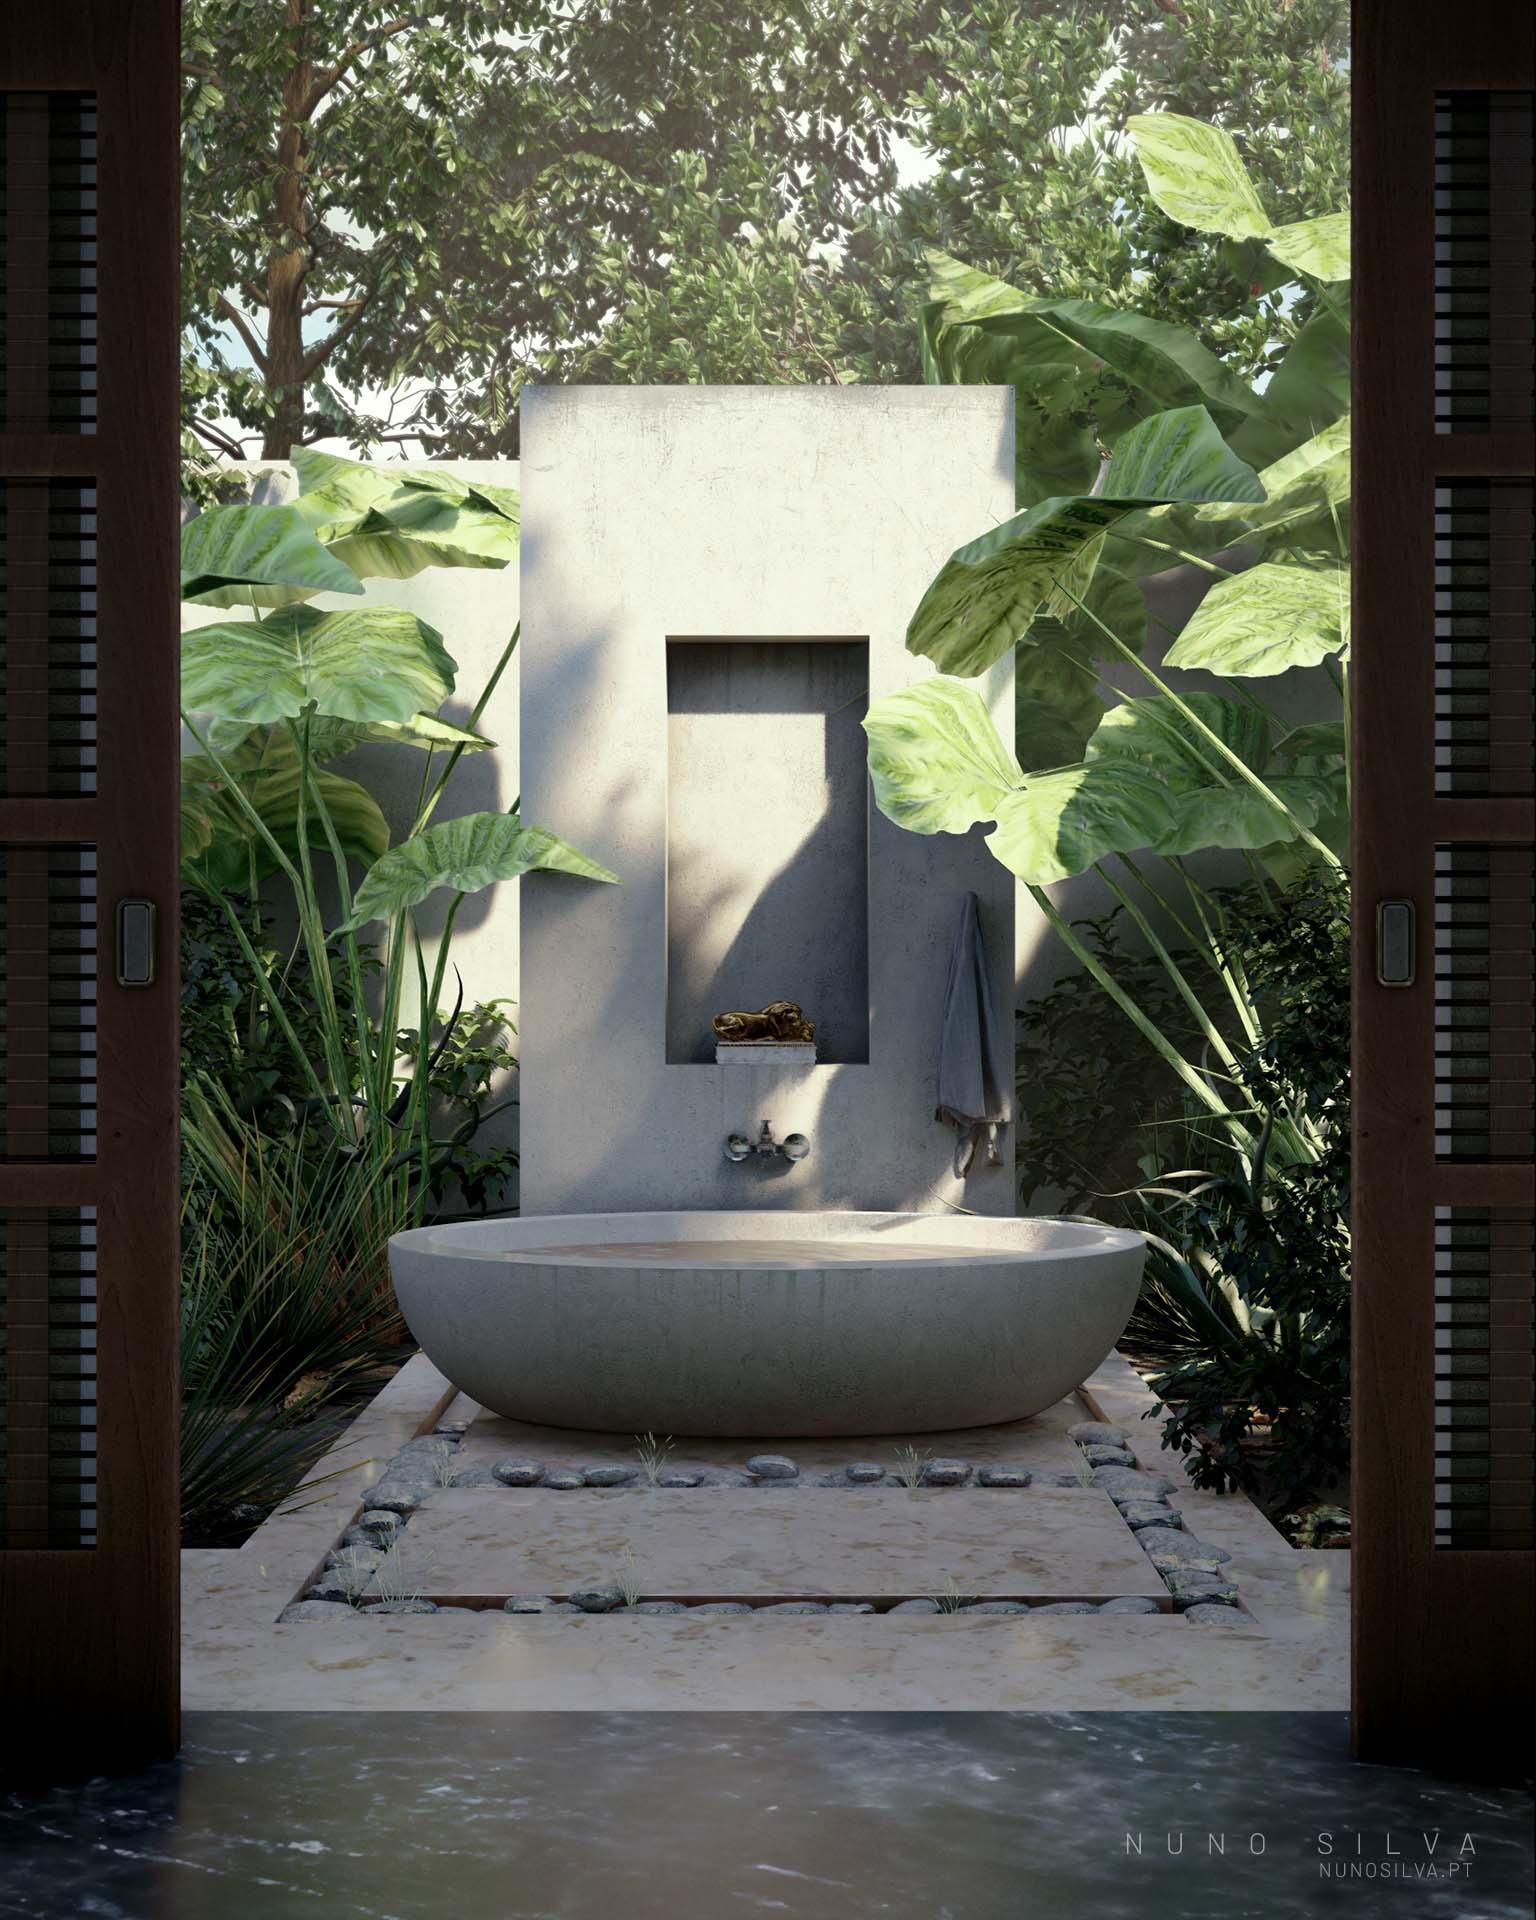 Bathtub Jungle